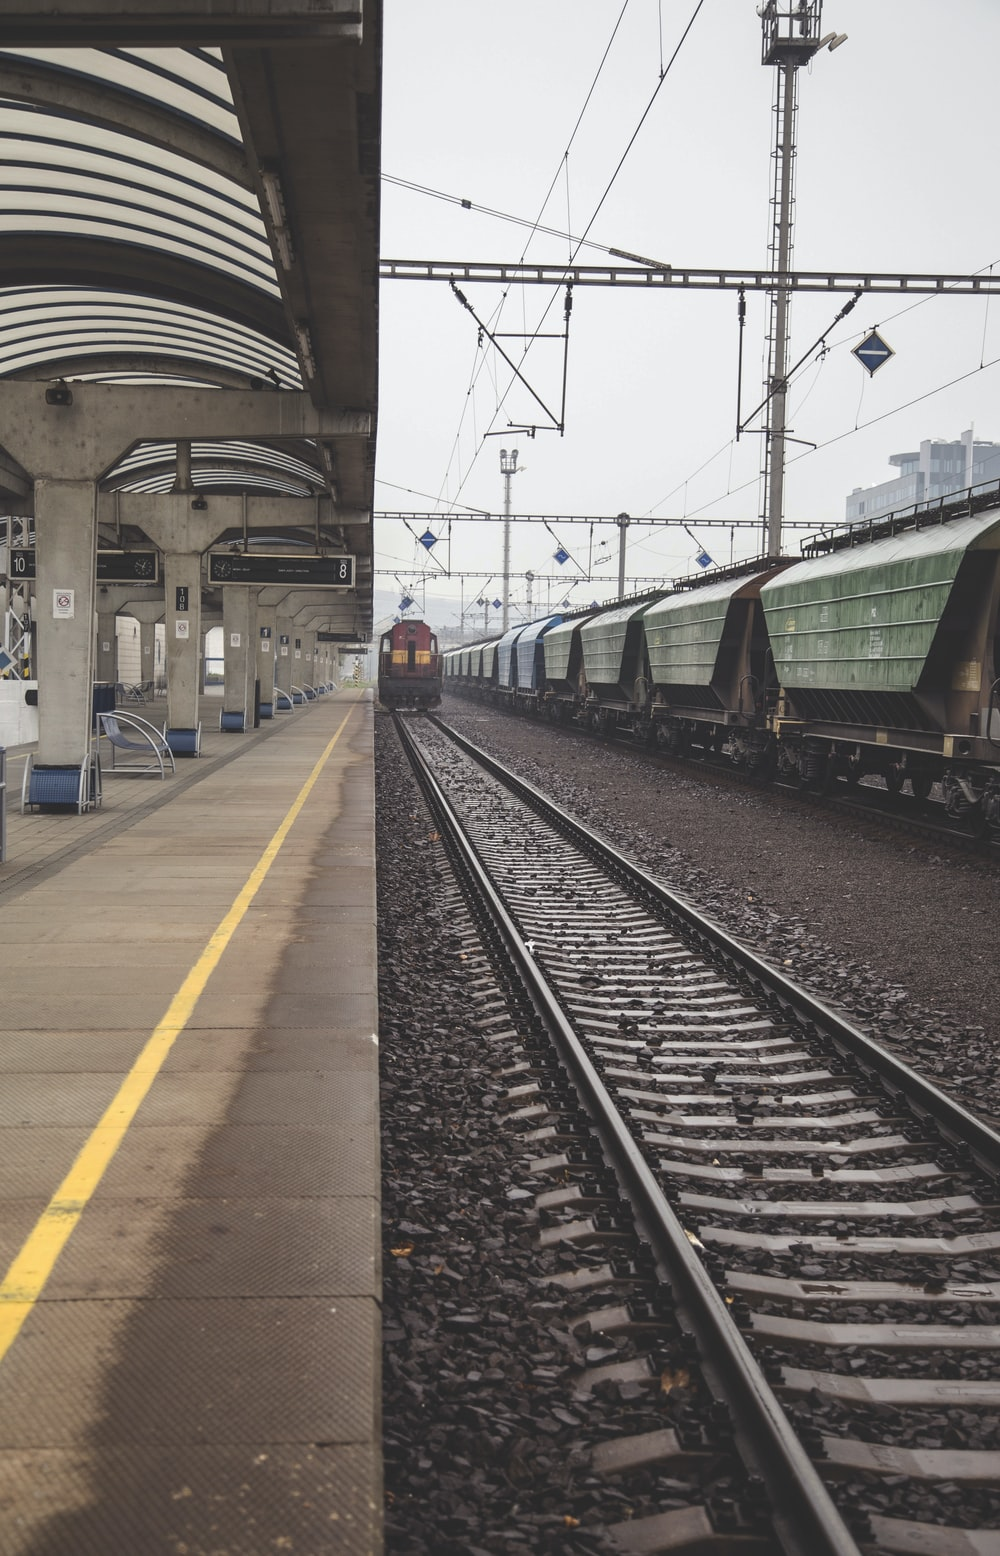 train station with train rail